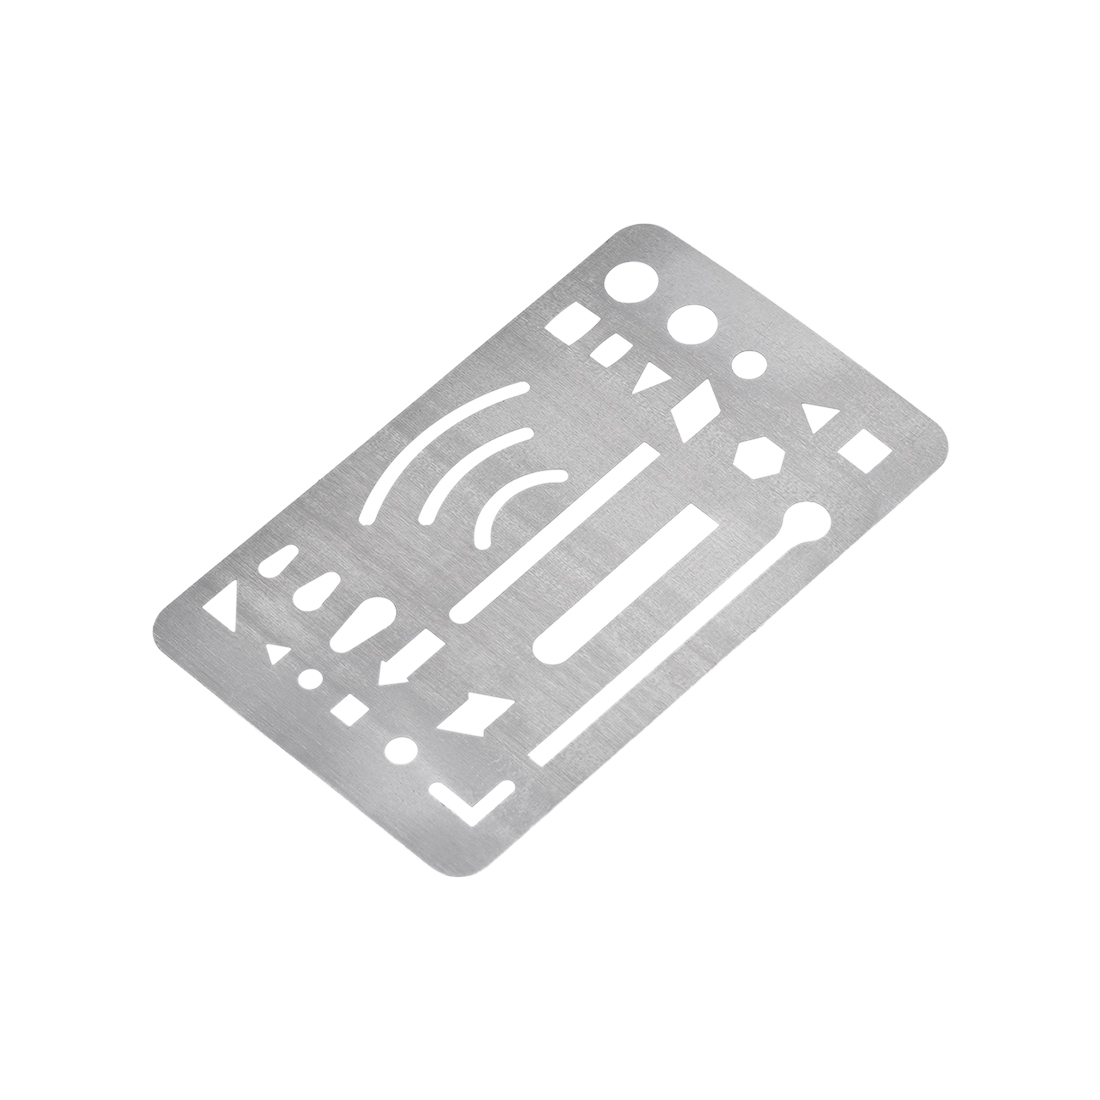 Erasing Shield 27 Patterns Stainless Steel 90x52x0.12mm